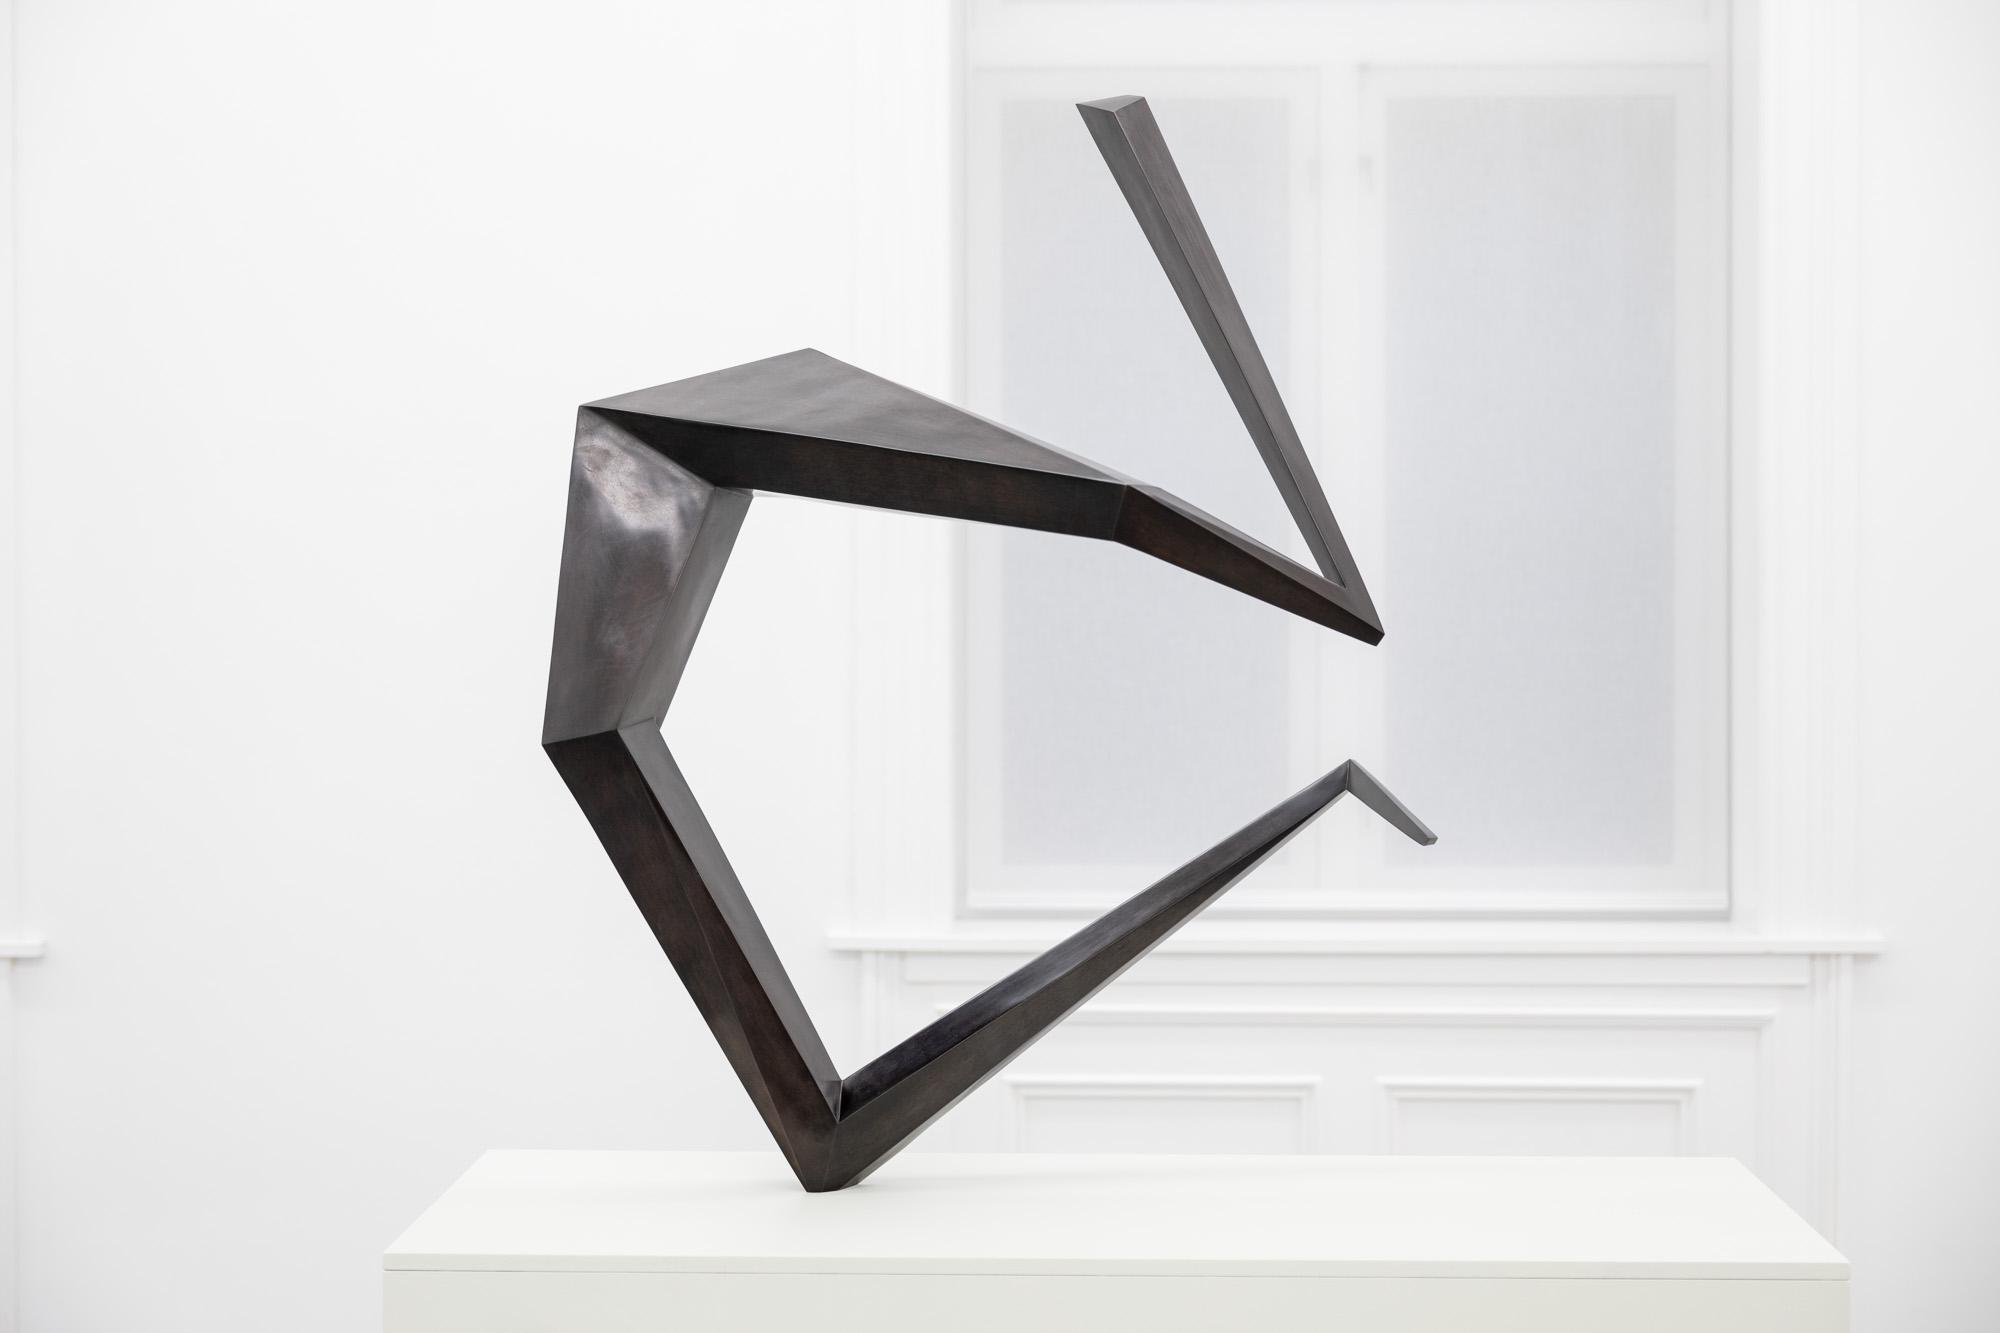 Open Fold, 2020, Patinated bronze, H 107,5 x B 58,5 x D 88 cm, Ed. 3 + 1 AP